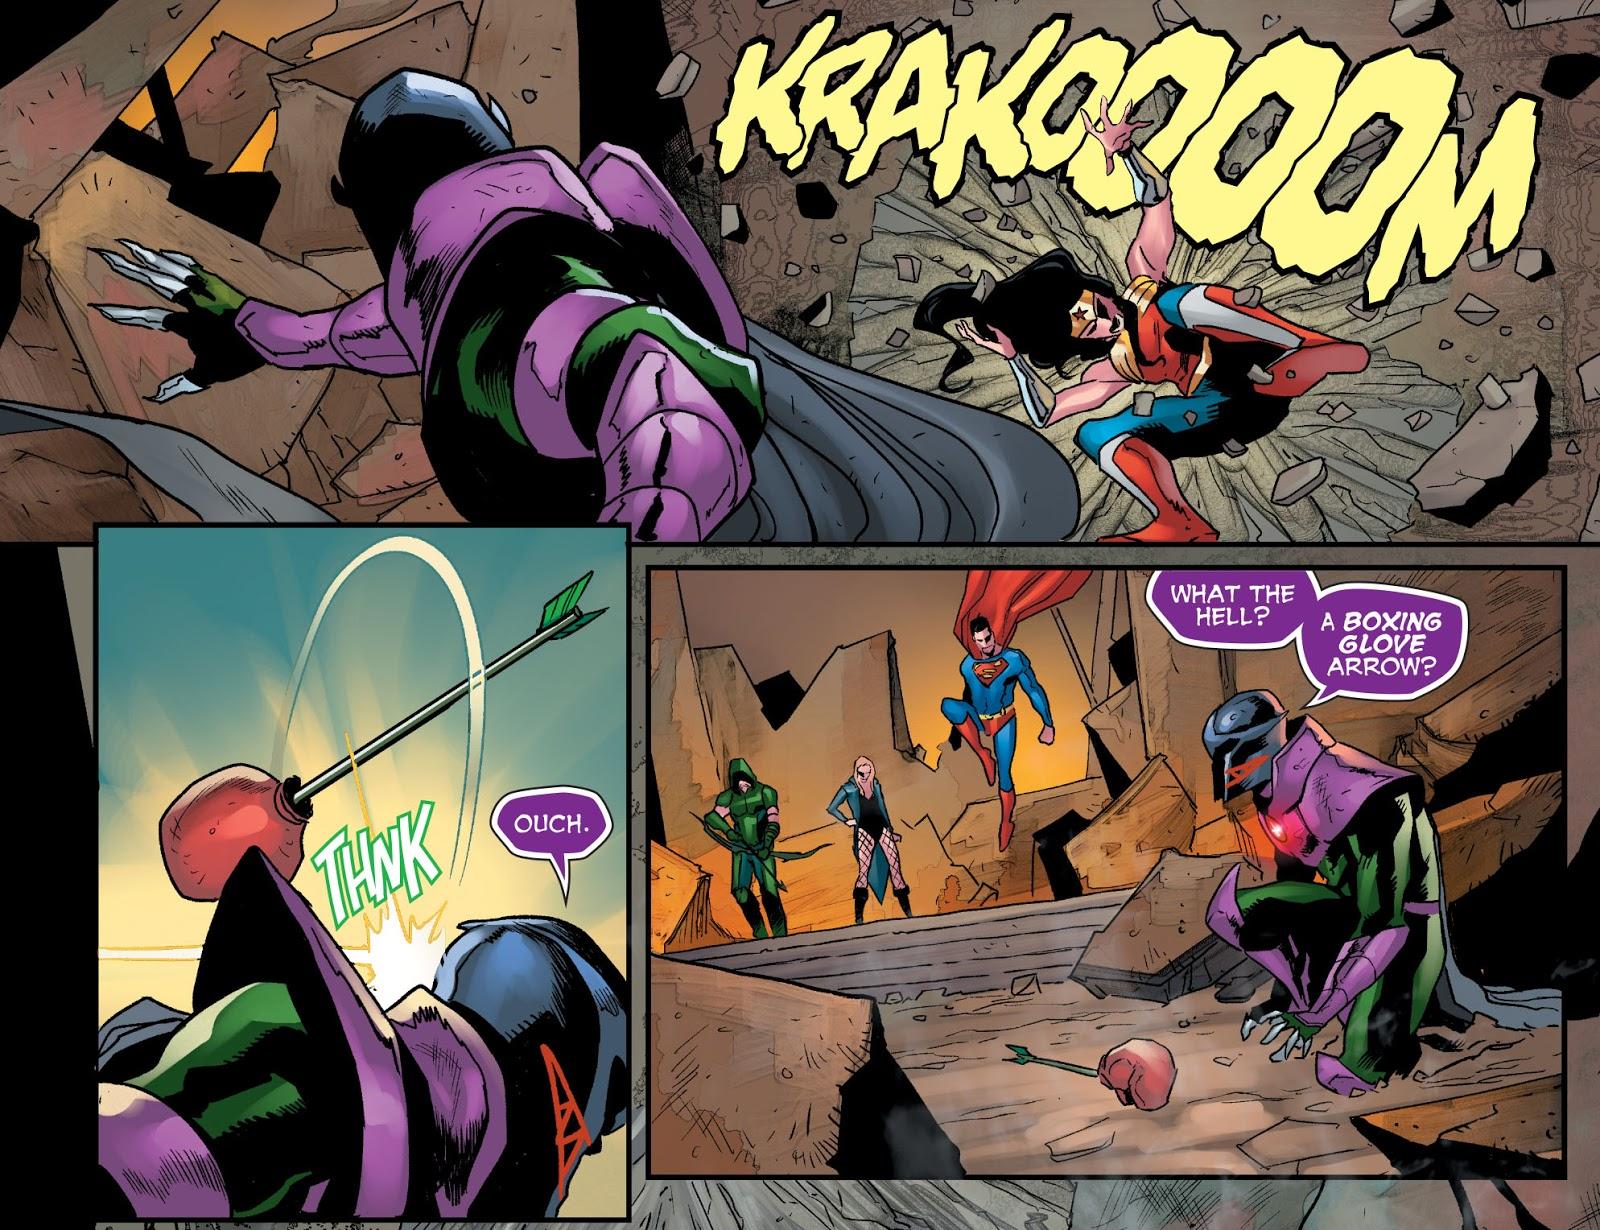 The Joker Appreciates The Boxing Glove Arrow